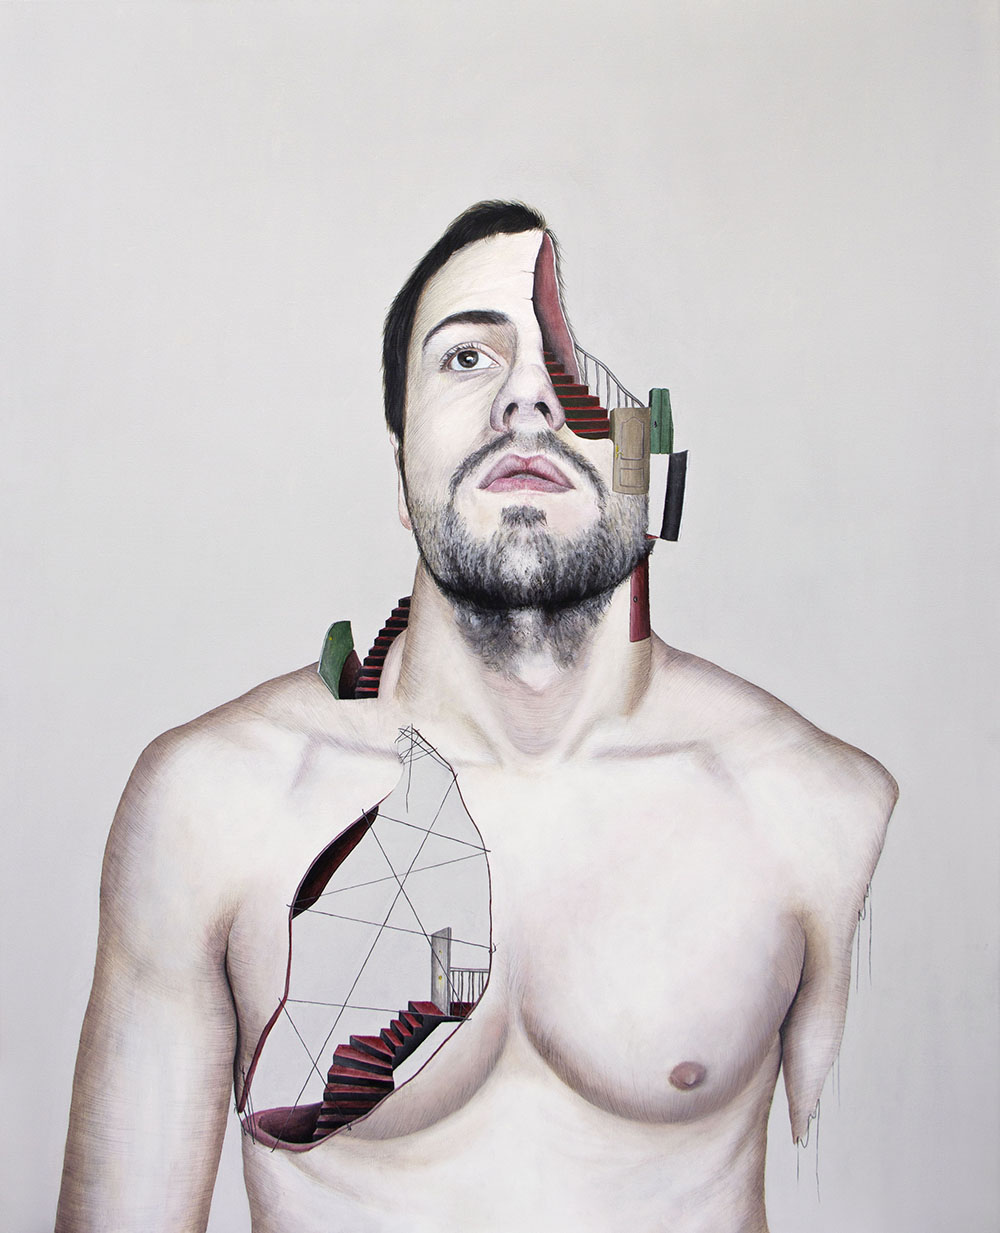 Secuelas, 01. Técnica mixta sobre lienzo. 100 x 81 cm. 2013